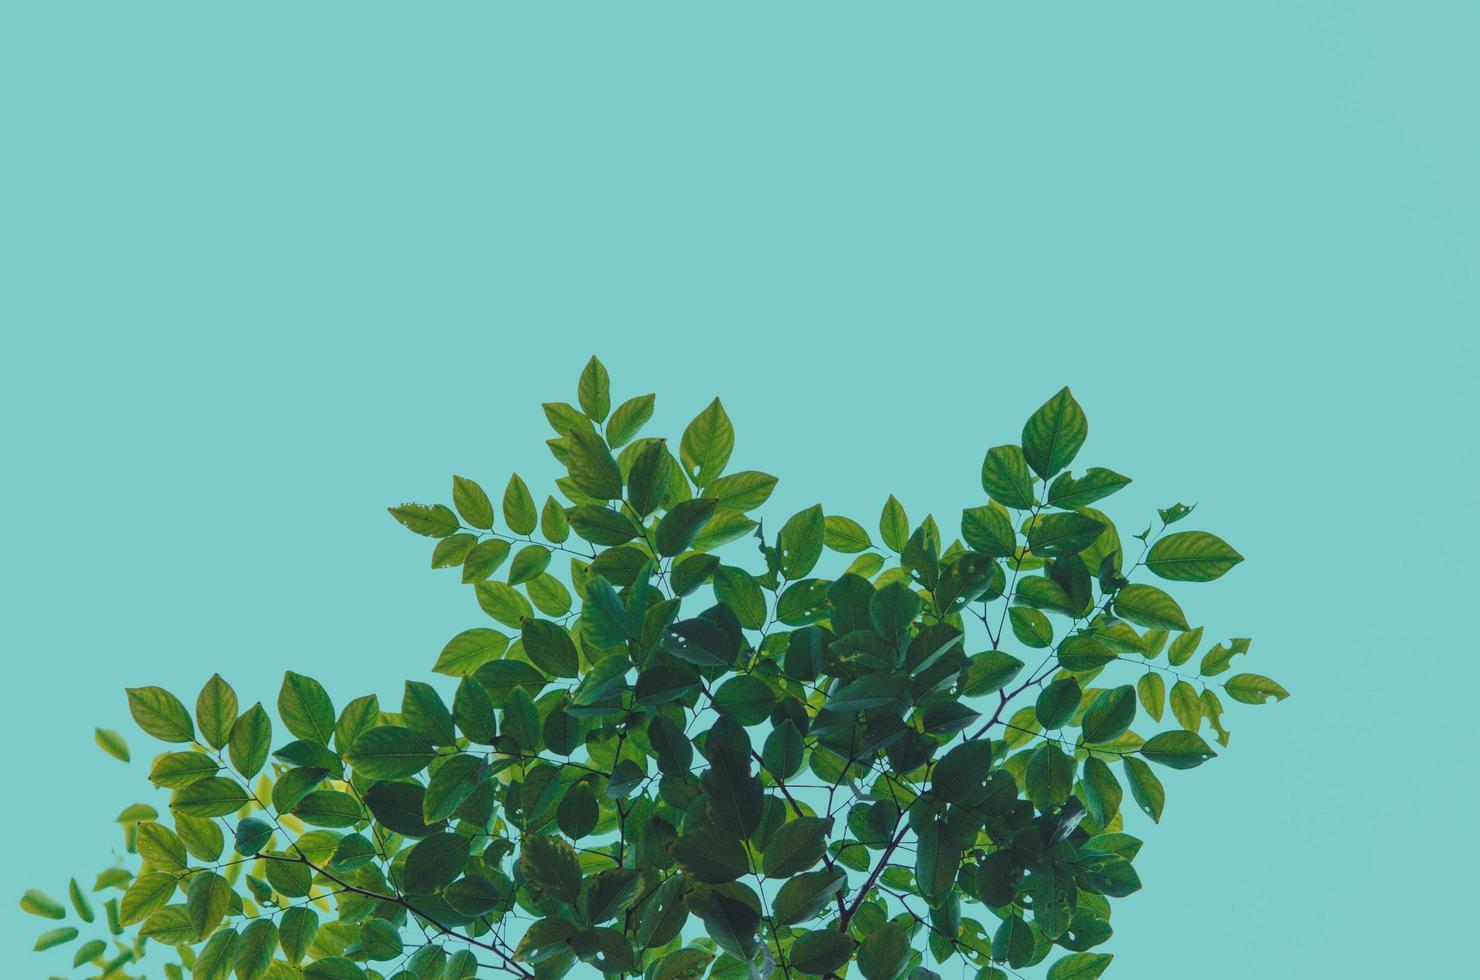 foglie verdi su sfondo blu foto